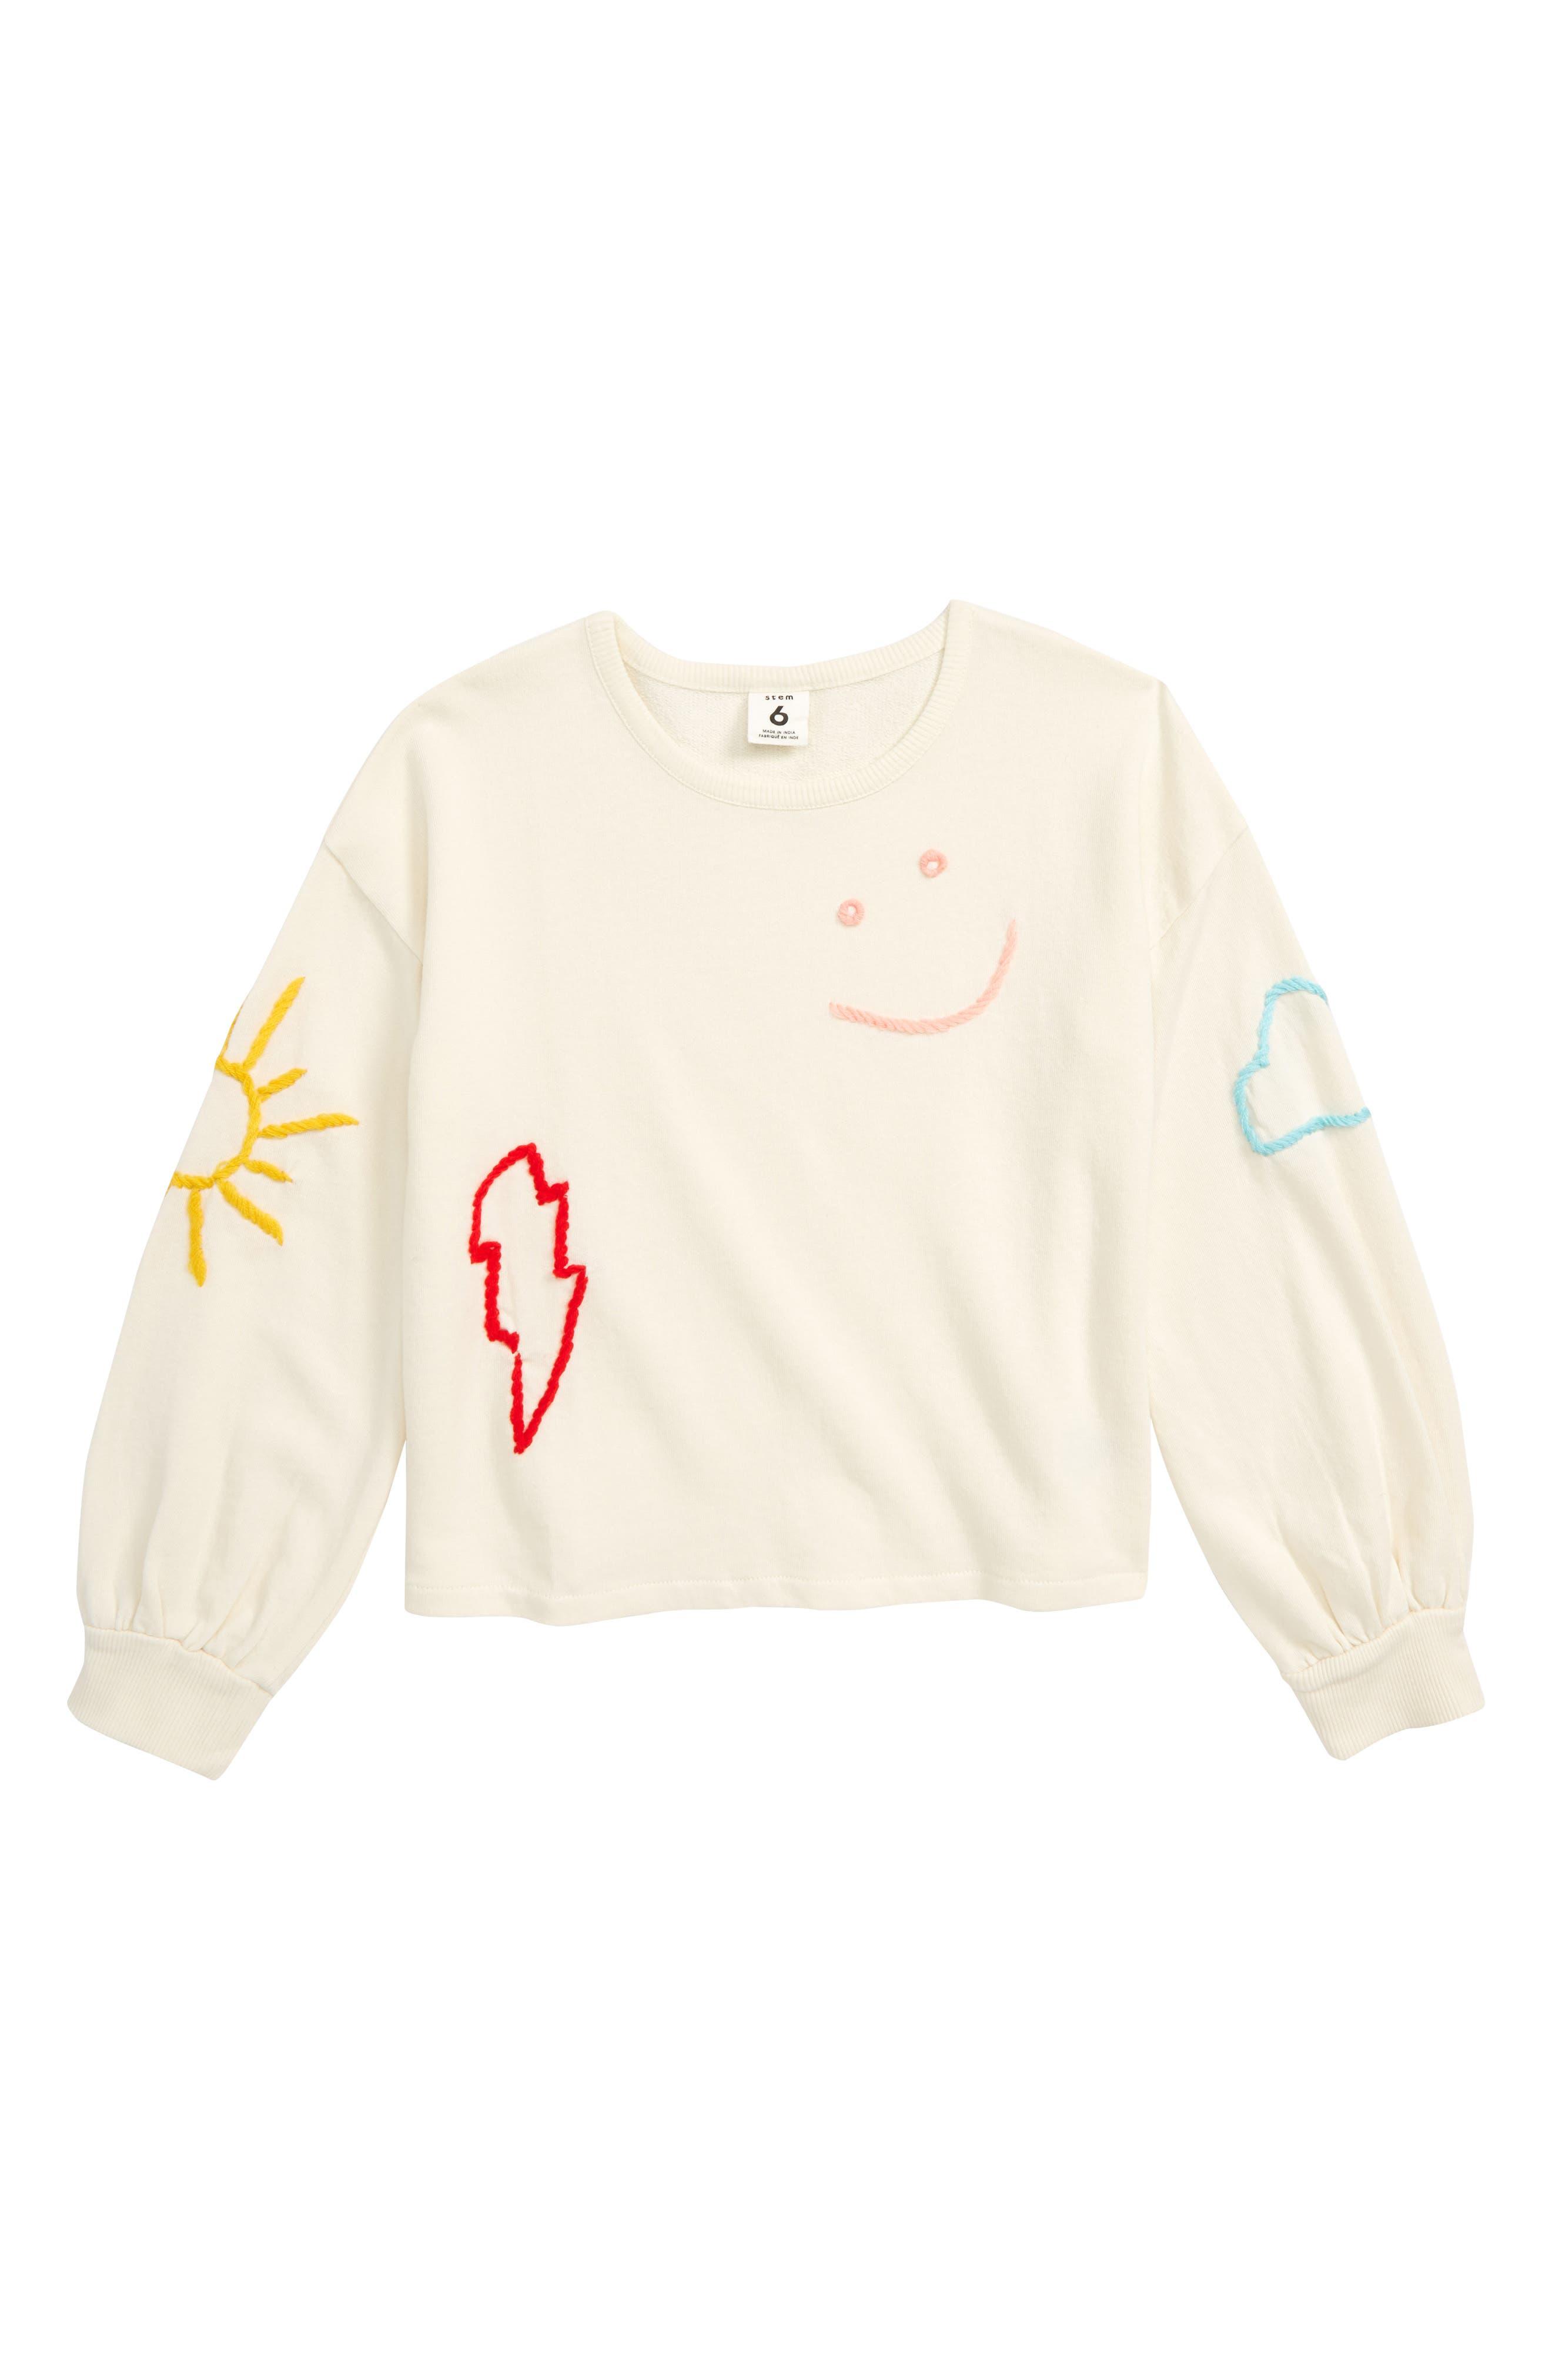 Toddler Girls Stem Embroidered Sweatshirt Size 3T  Ivory